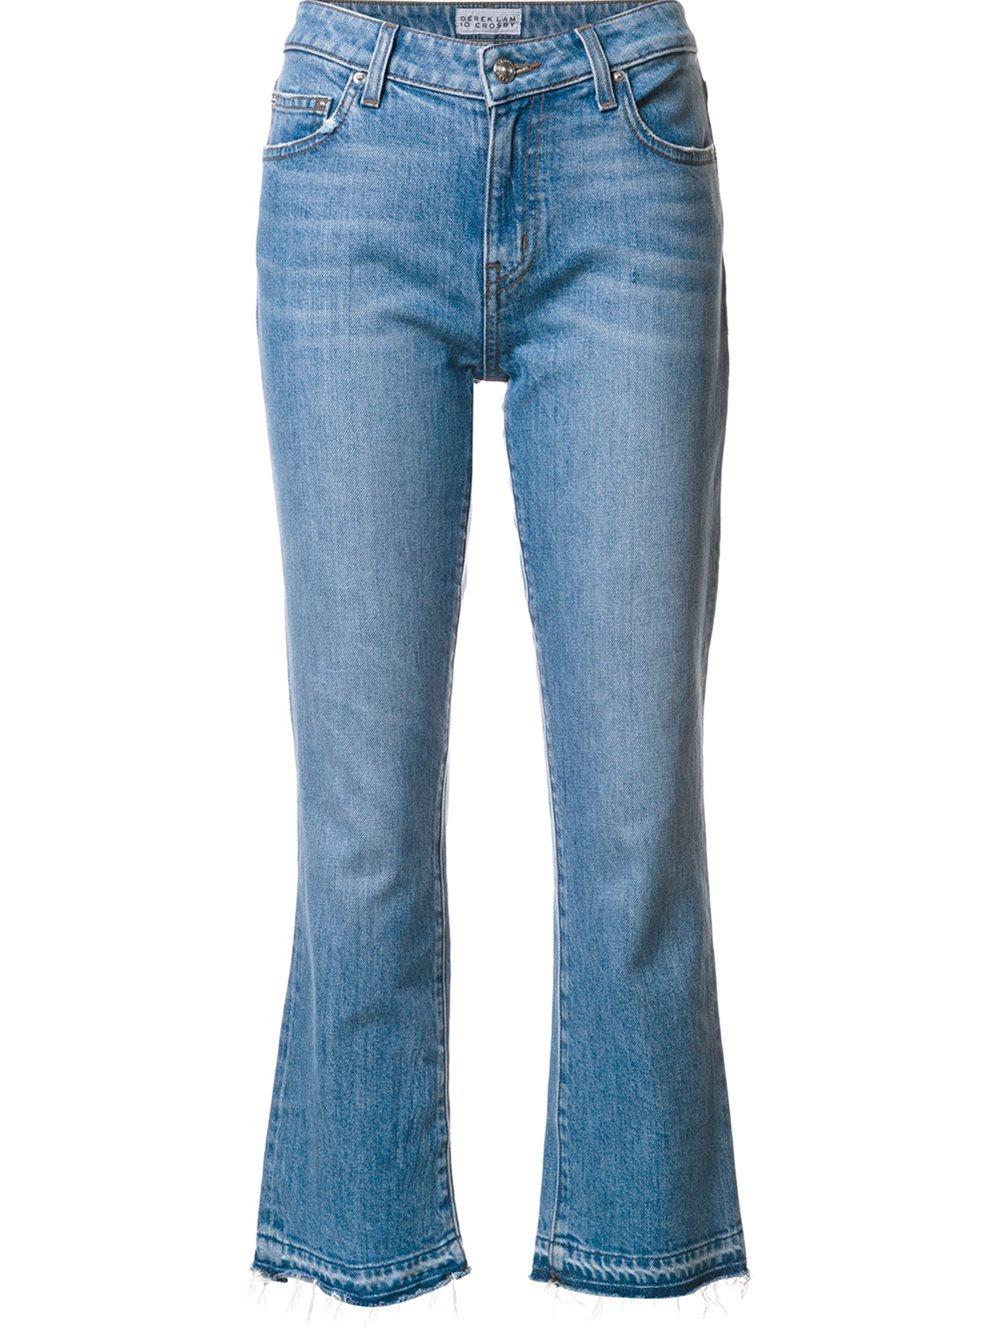 10 crosby derek lam cropped flare jeans in blue lyst. Black Bedroom Furniture Sets. Home Design Ideas